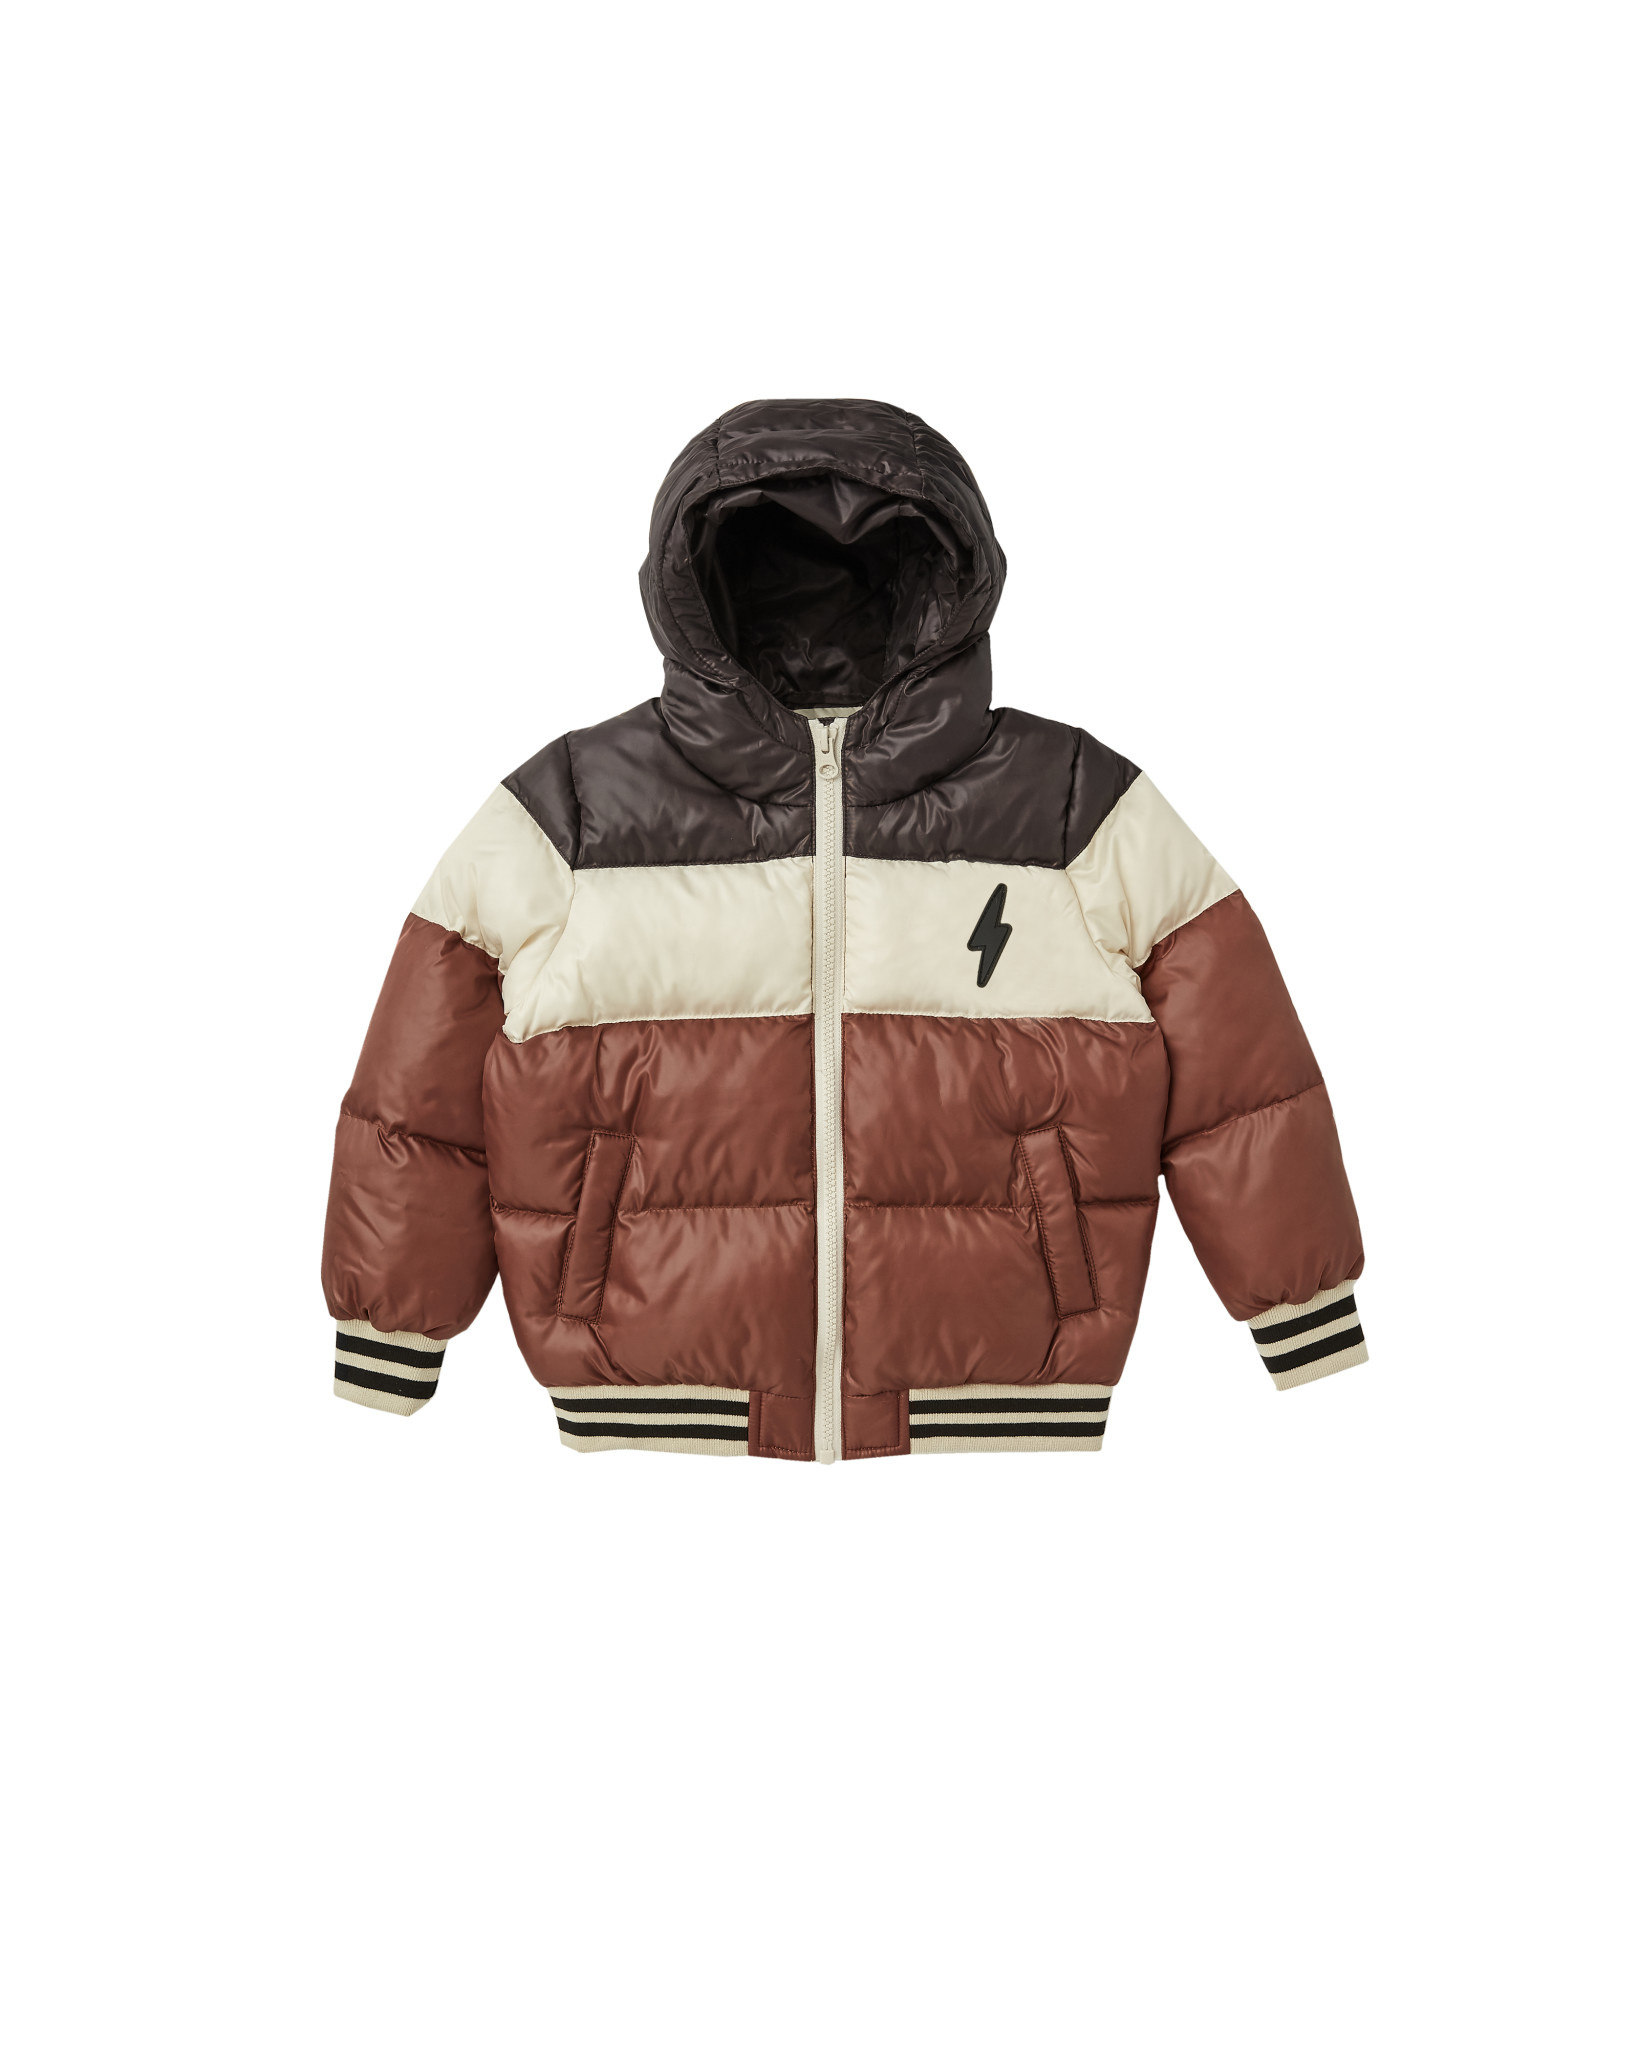 RYLEE AND CRU Color Block Puffer Jacket